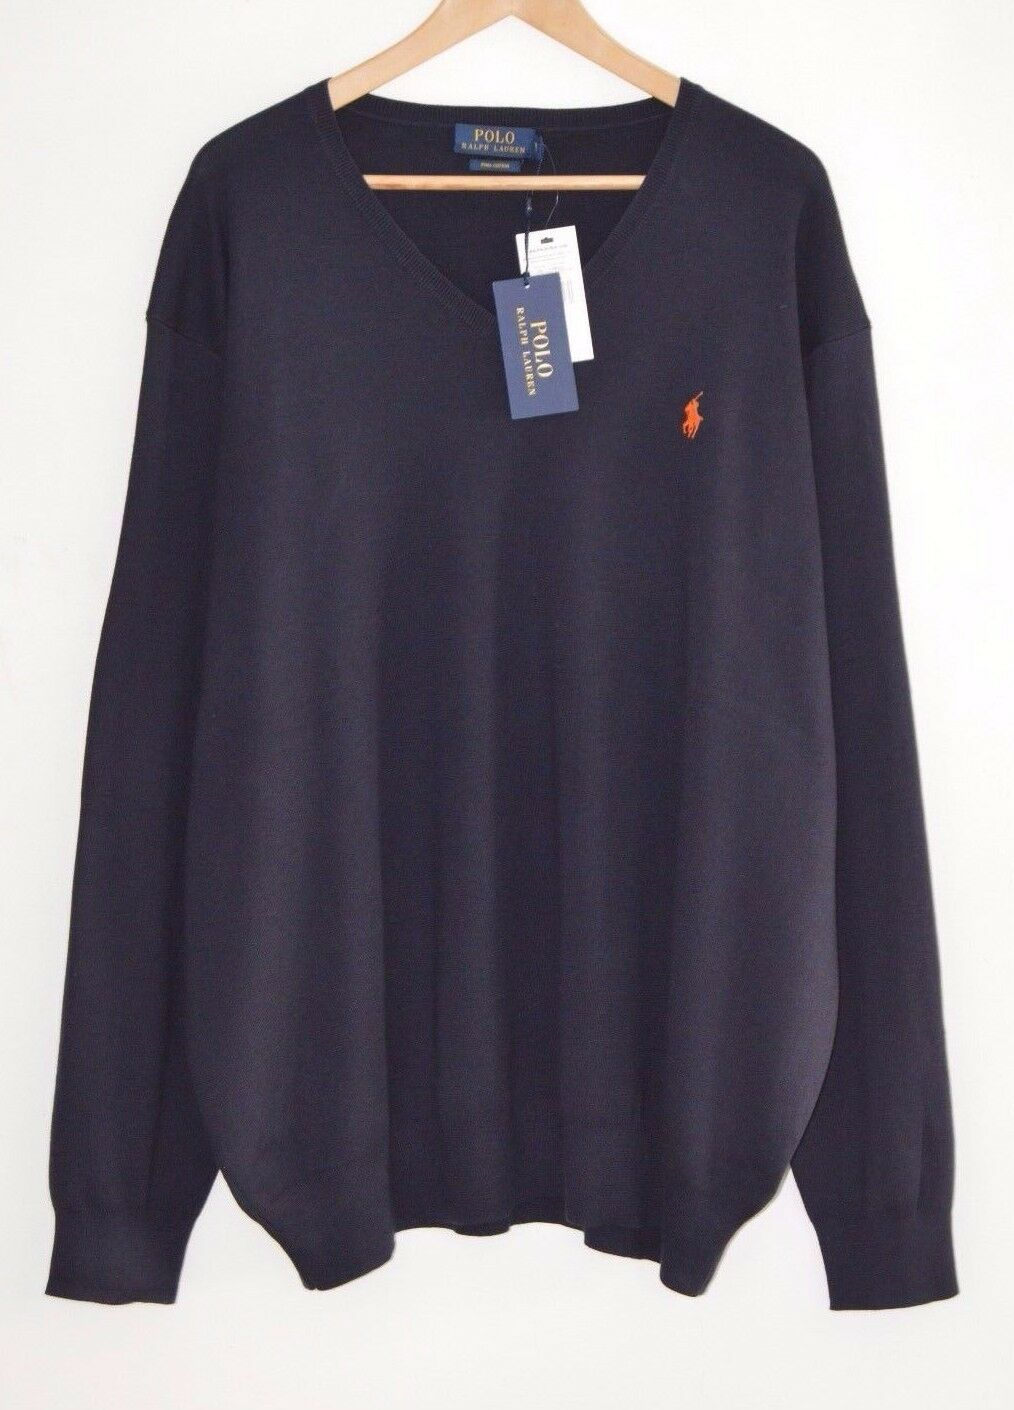 Ralph Lauren Polo Azul Jersey De Algodón Pima  Cuello en V Jersey 6X Grande 6XL 6XB XXXXXXL  A la venta con descuento del 70%.